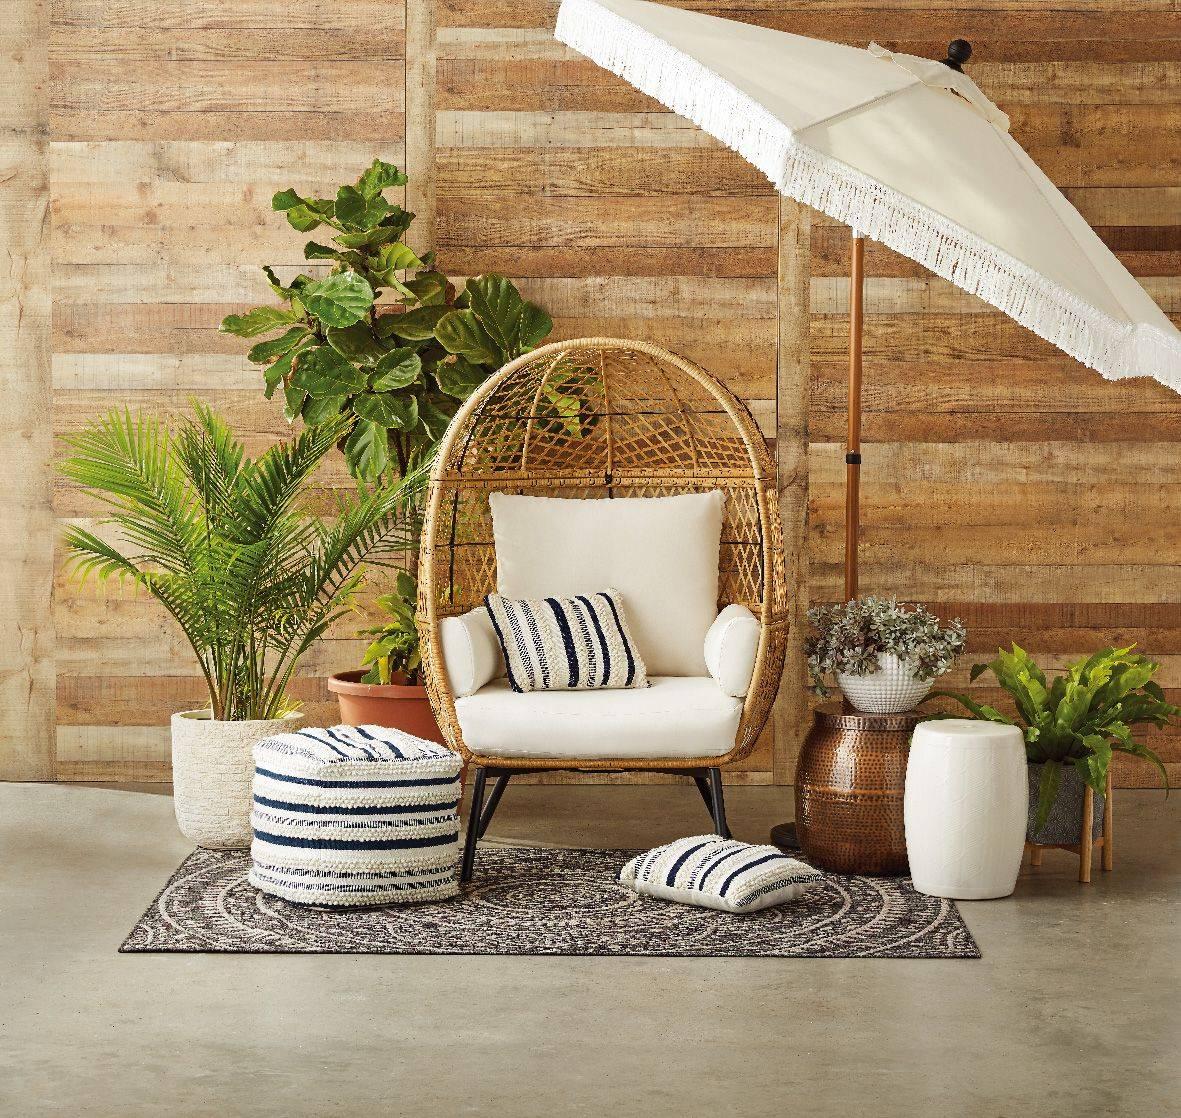 Egg Chair Wicker Bowl Seat Canopy White Umbrella Walmart Patio Outdoor Pouf